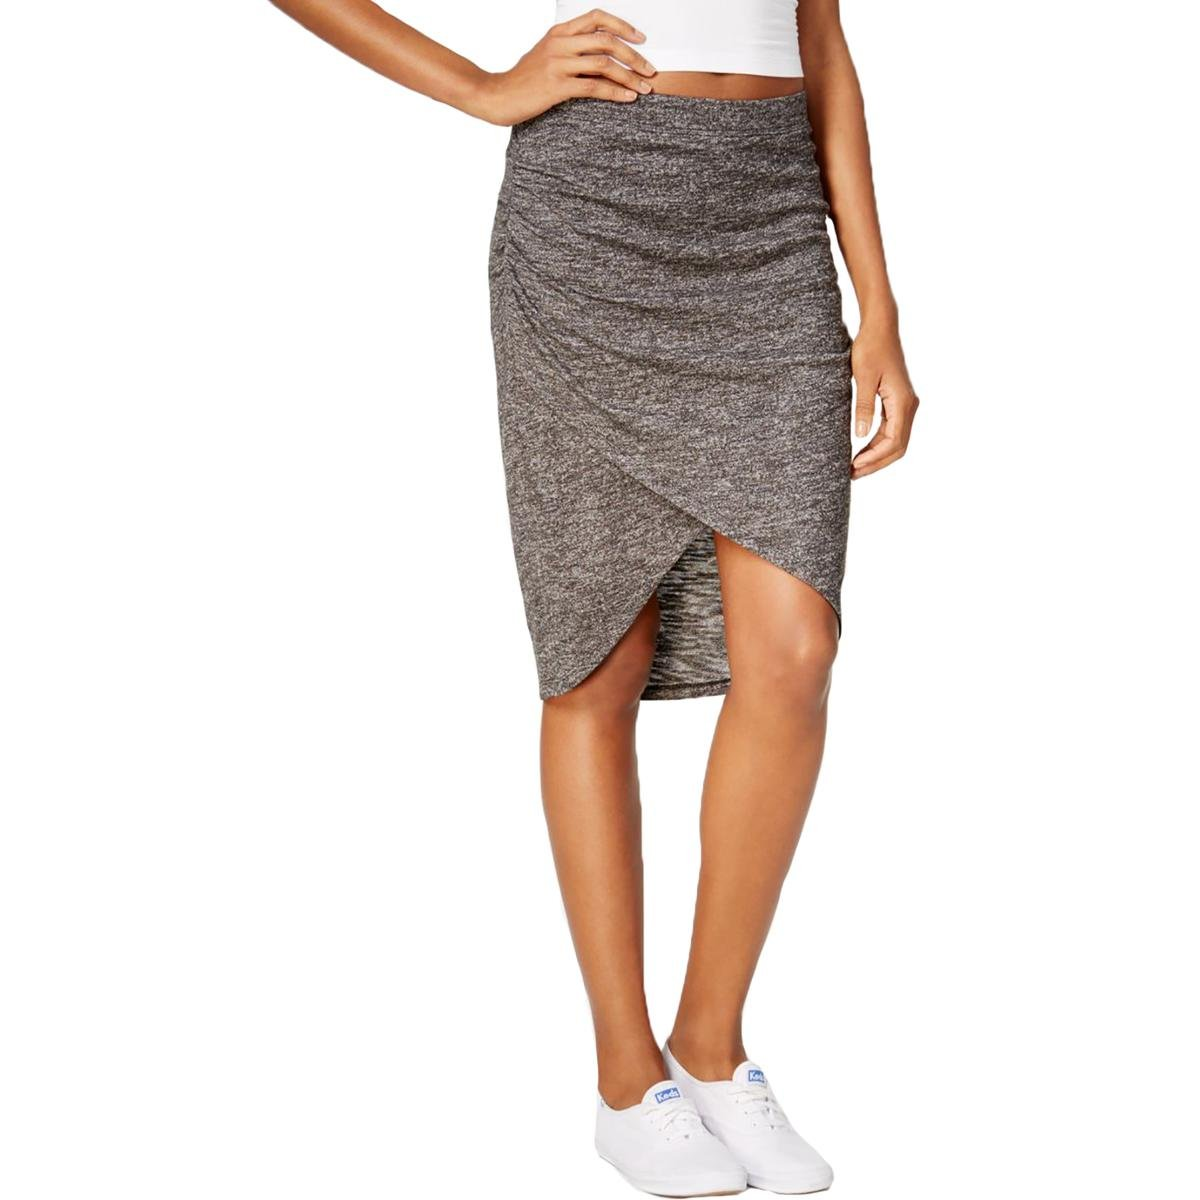 Soybu Women's Wren Skirt, Grey Heather, X-Large